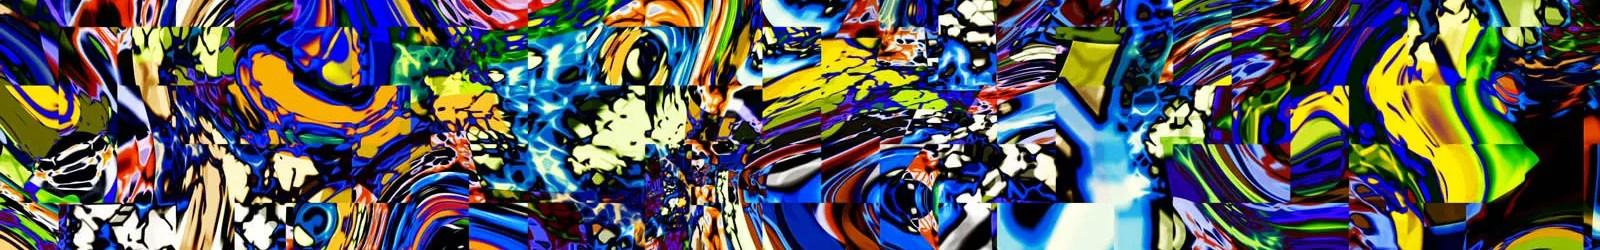 Dynamics 365 – Chaos Reigns